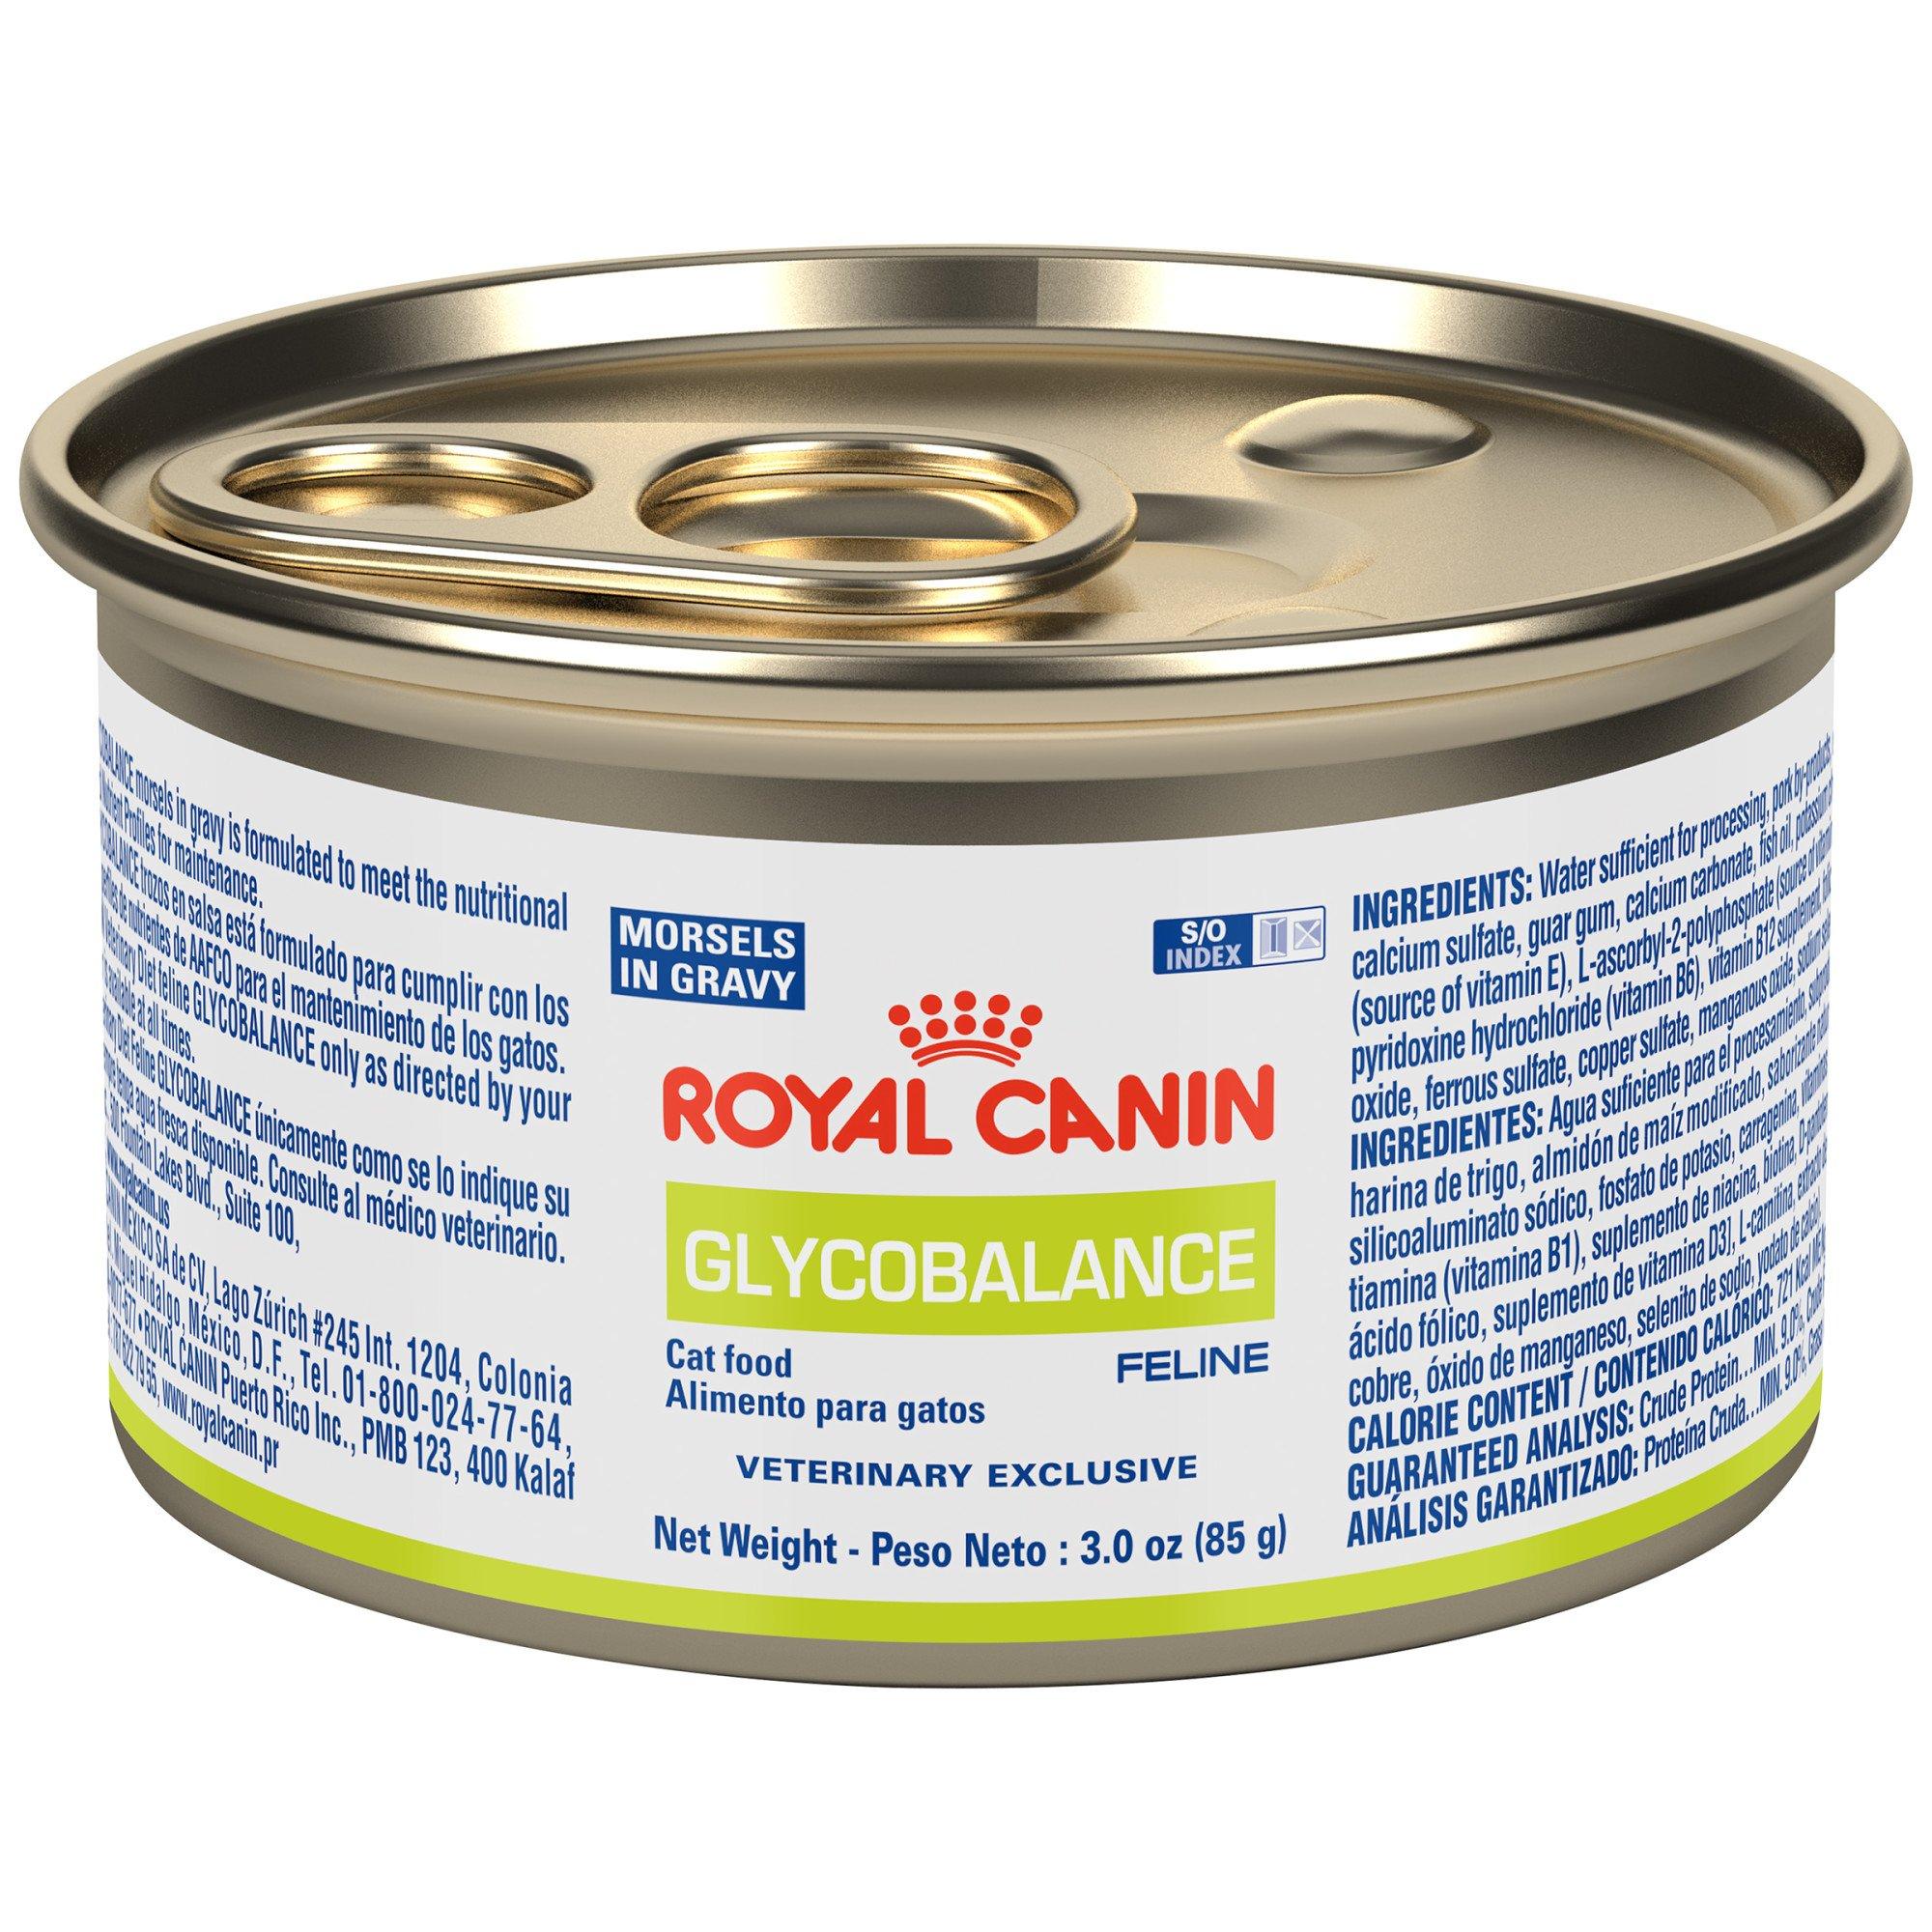 Royal Canin Glycobalance Wet Cat Food 3 Oz Case Of 24 Petco Canned Cat Food Wet Cat Food Best Cat Food